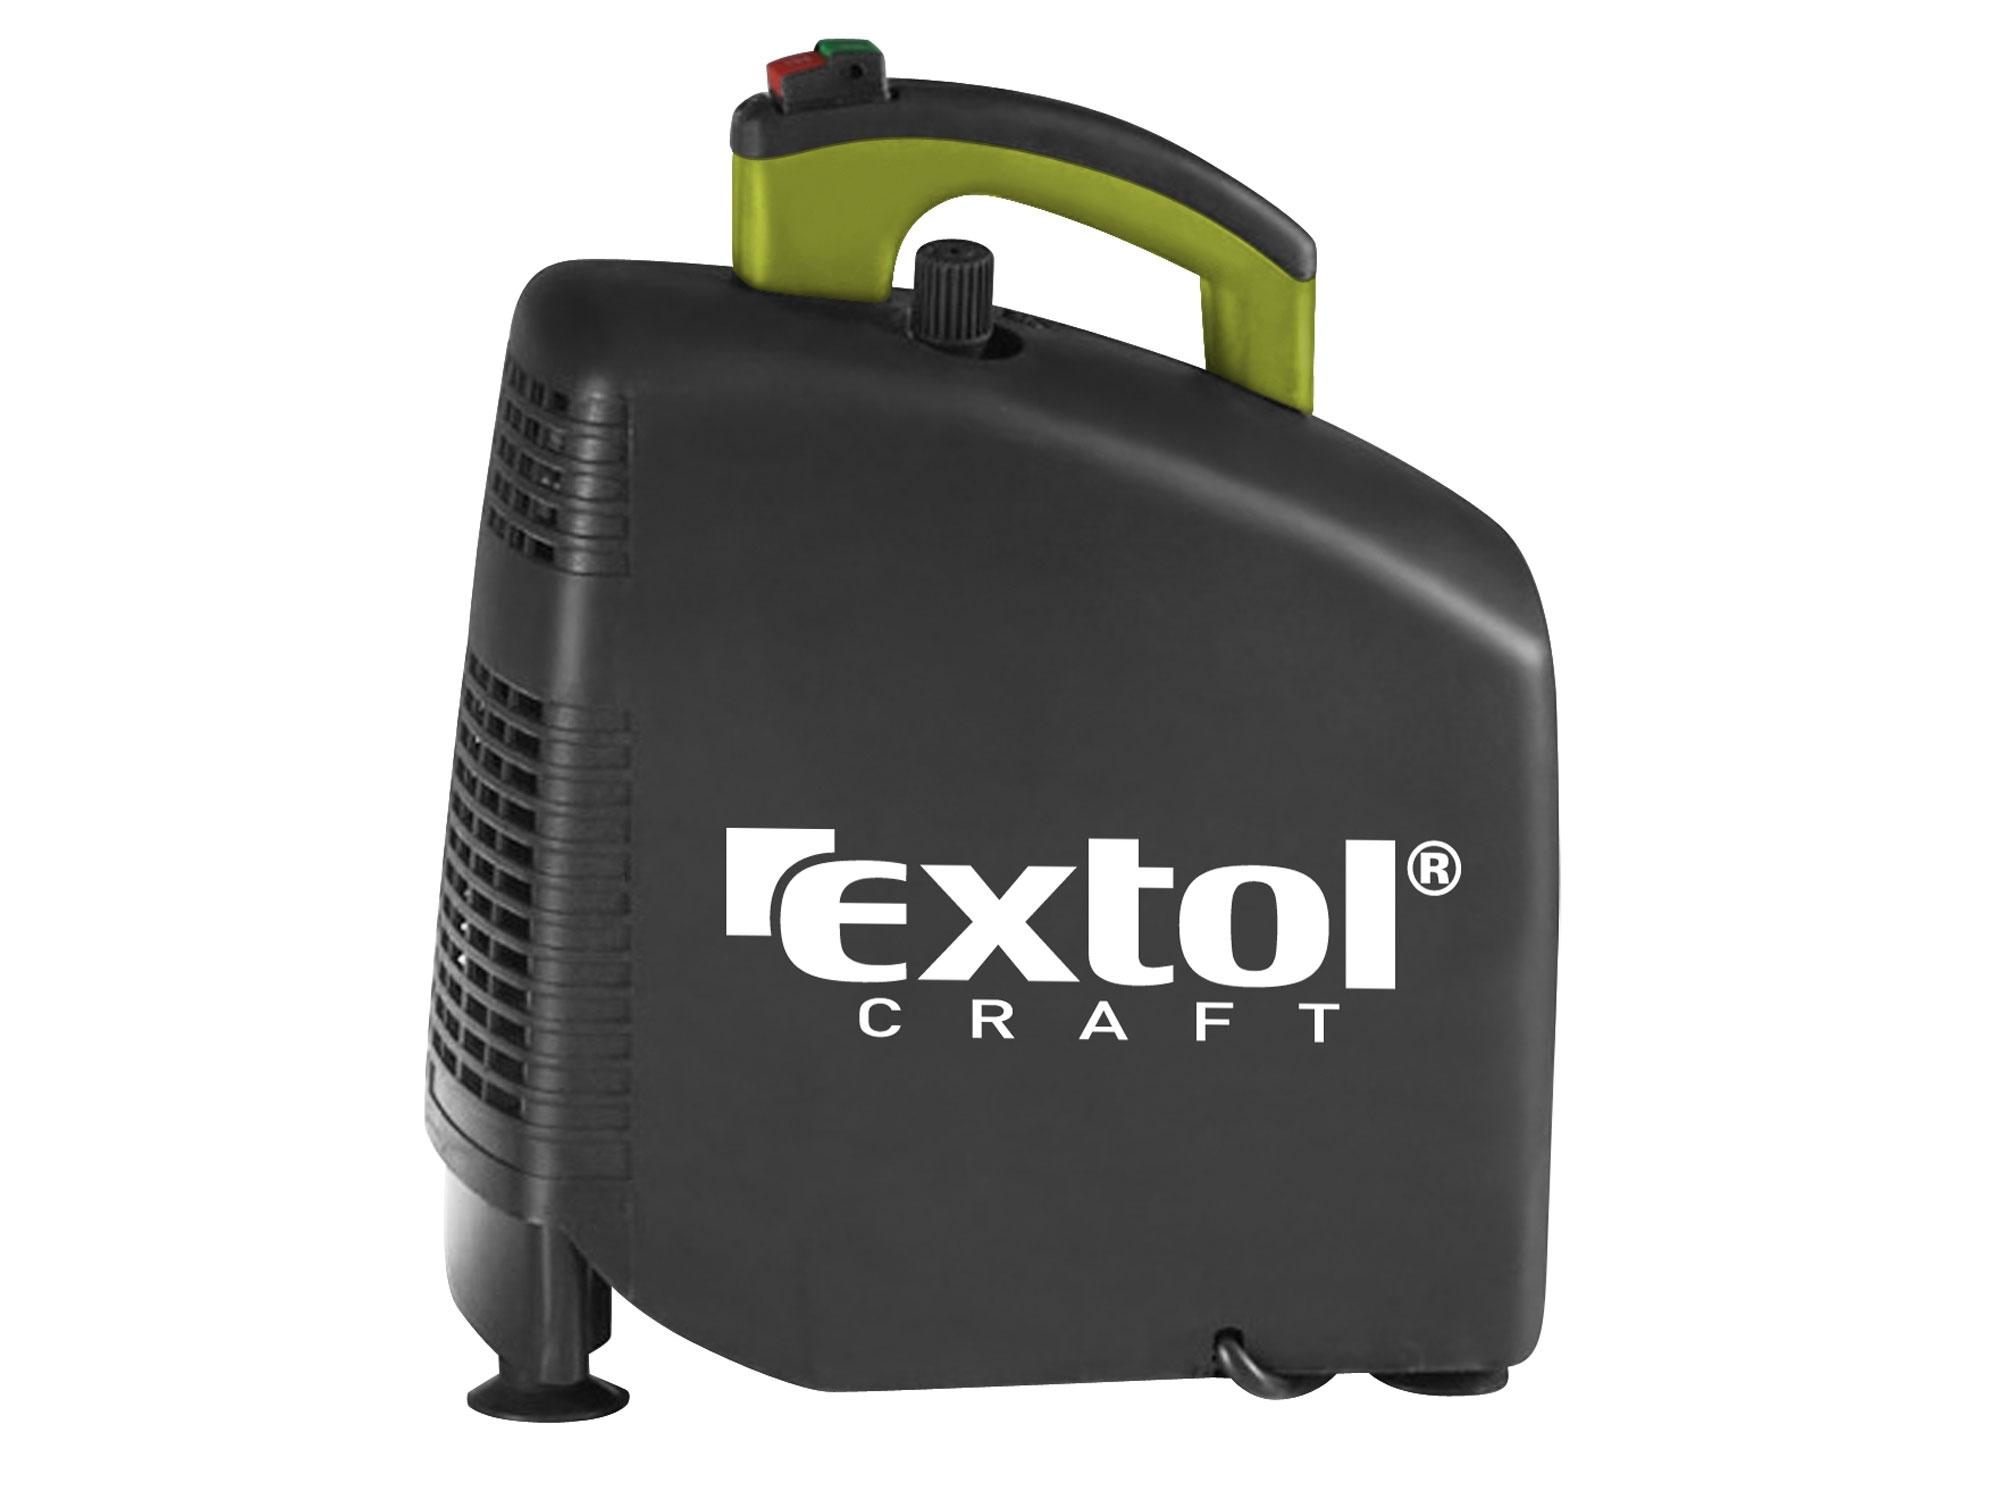 kompresor bezolejový, 1100W, EXTOL CRAFT, 418100